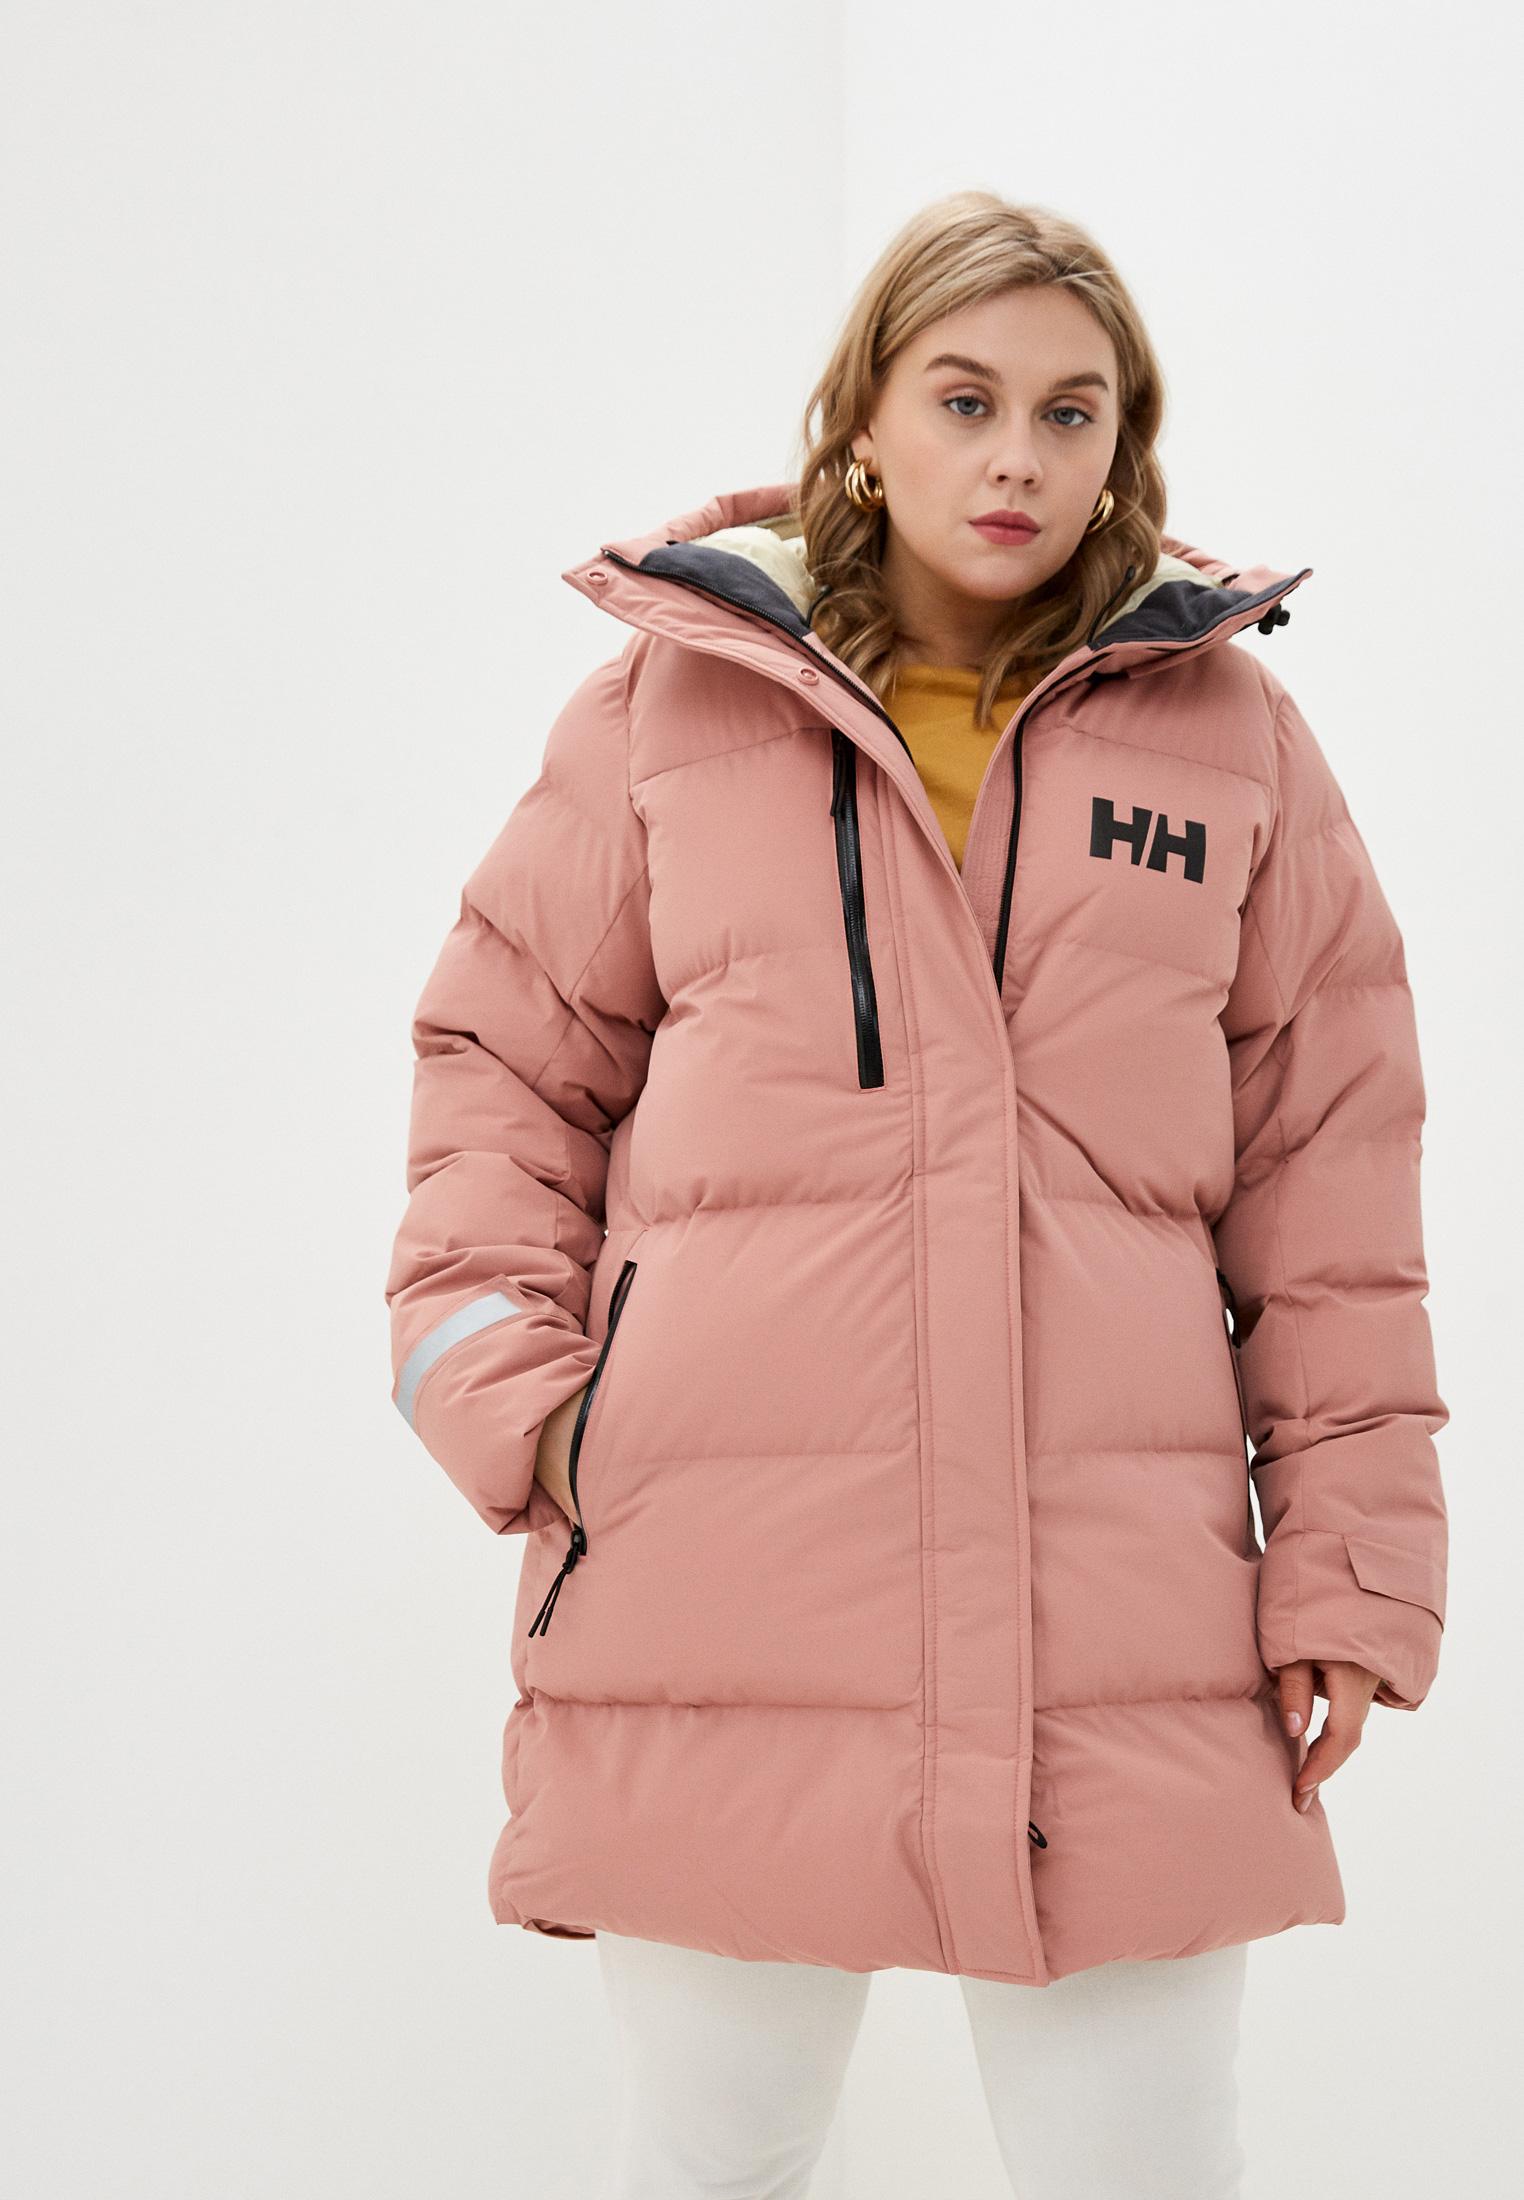 Женская верхняя одежда Helly Hansen (Хелли Хансен) 53205